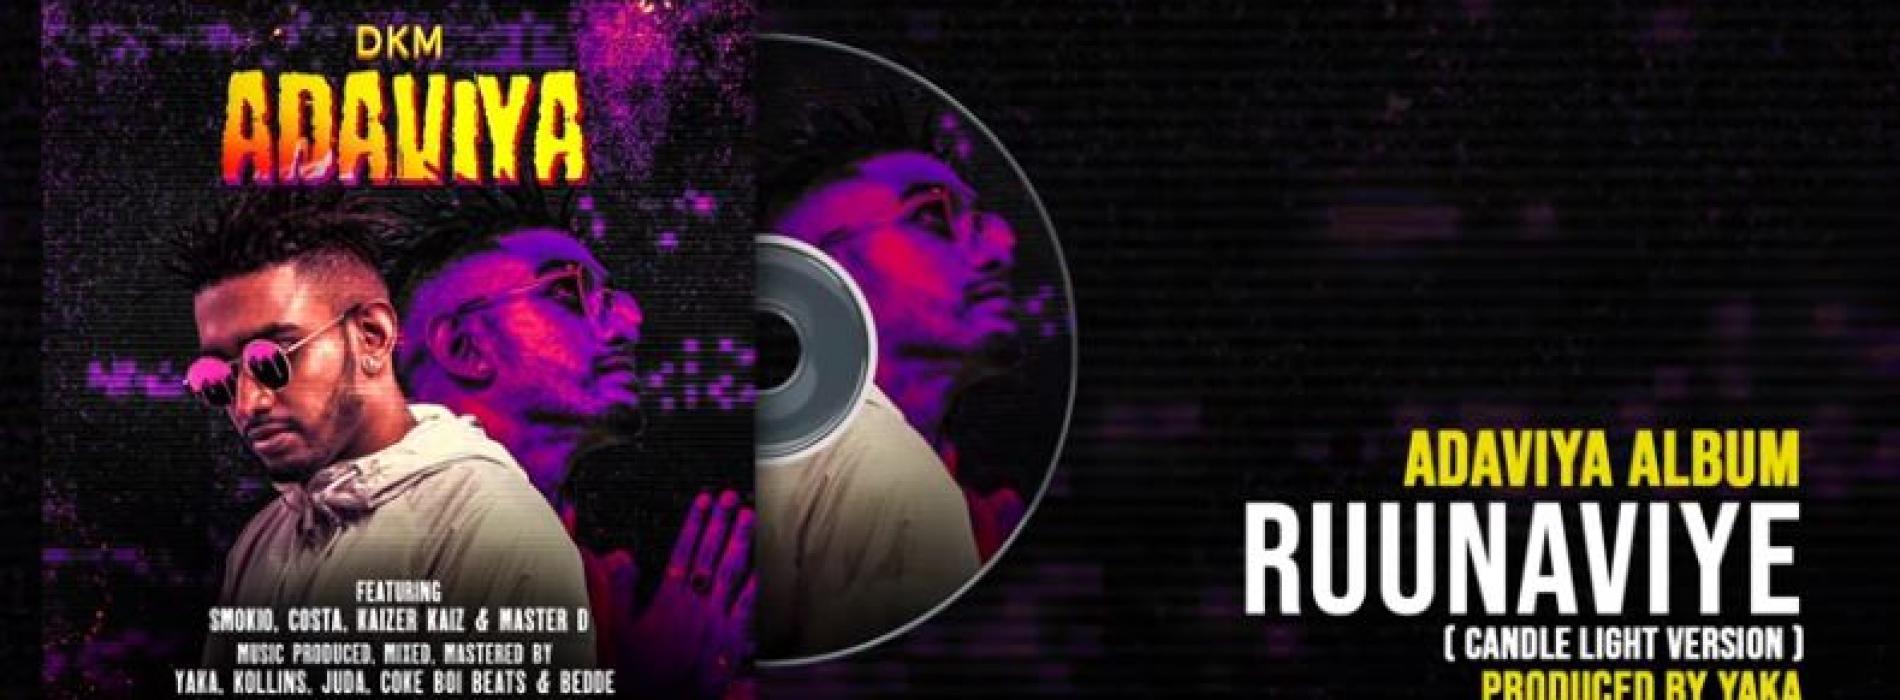 New Music : Ruunaviye (රූනාවියේ) – DKM ft YAKA (Candle Light Version)